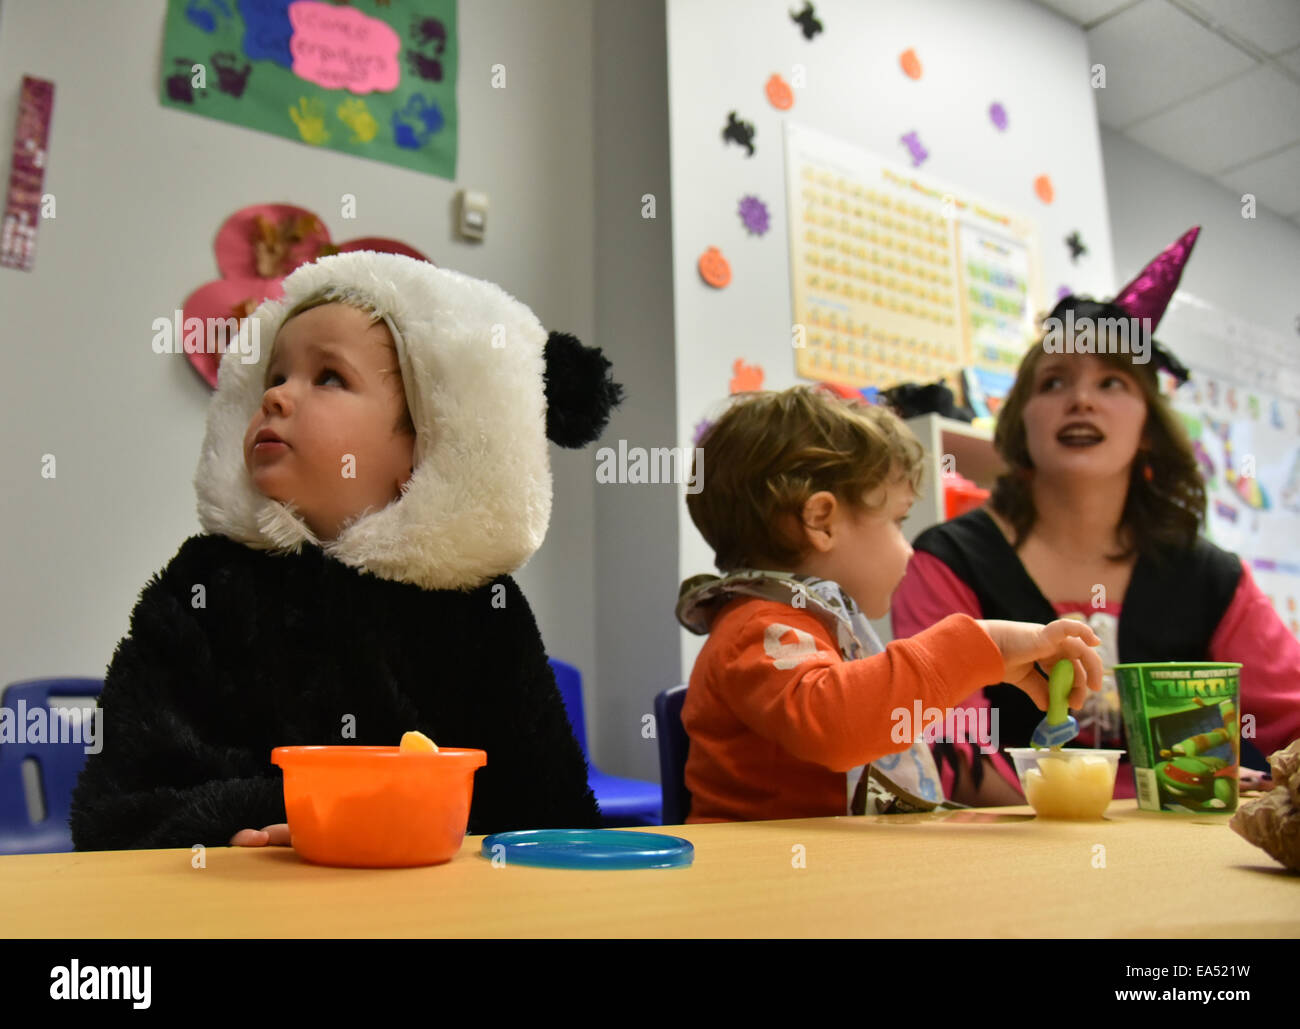 Preschool children with their teacher in fancy dress in their kindergarten classroom at halloween - Stock Image